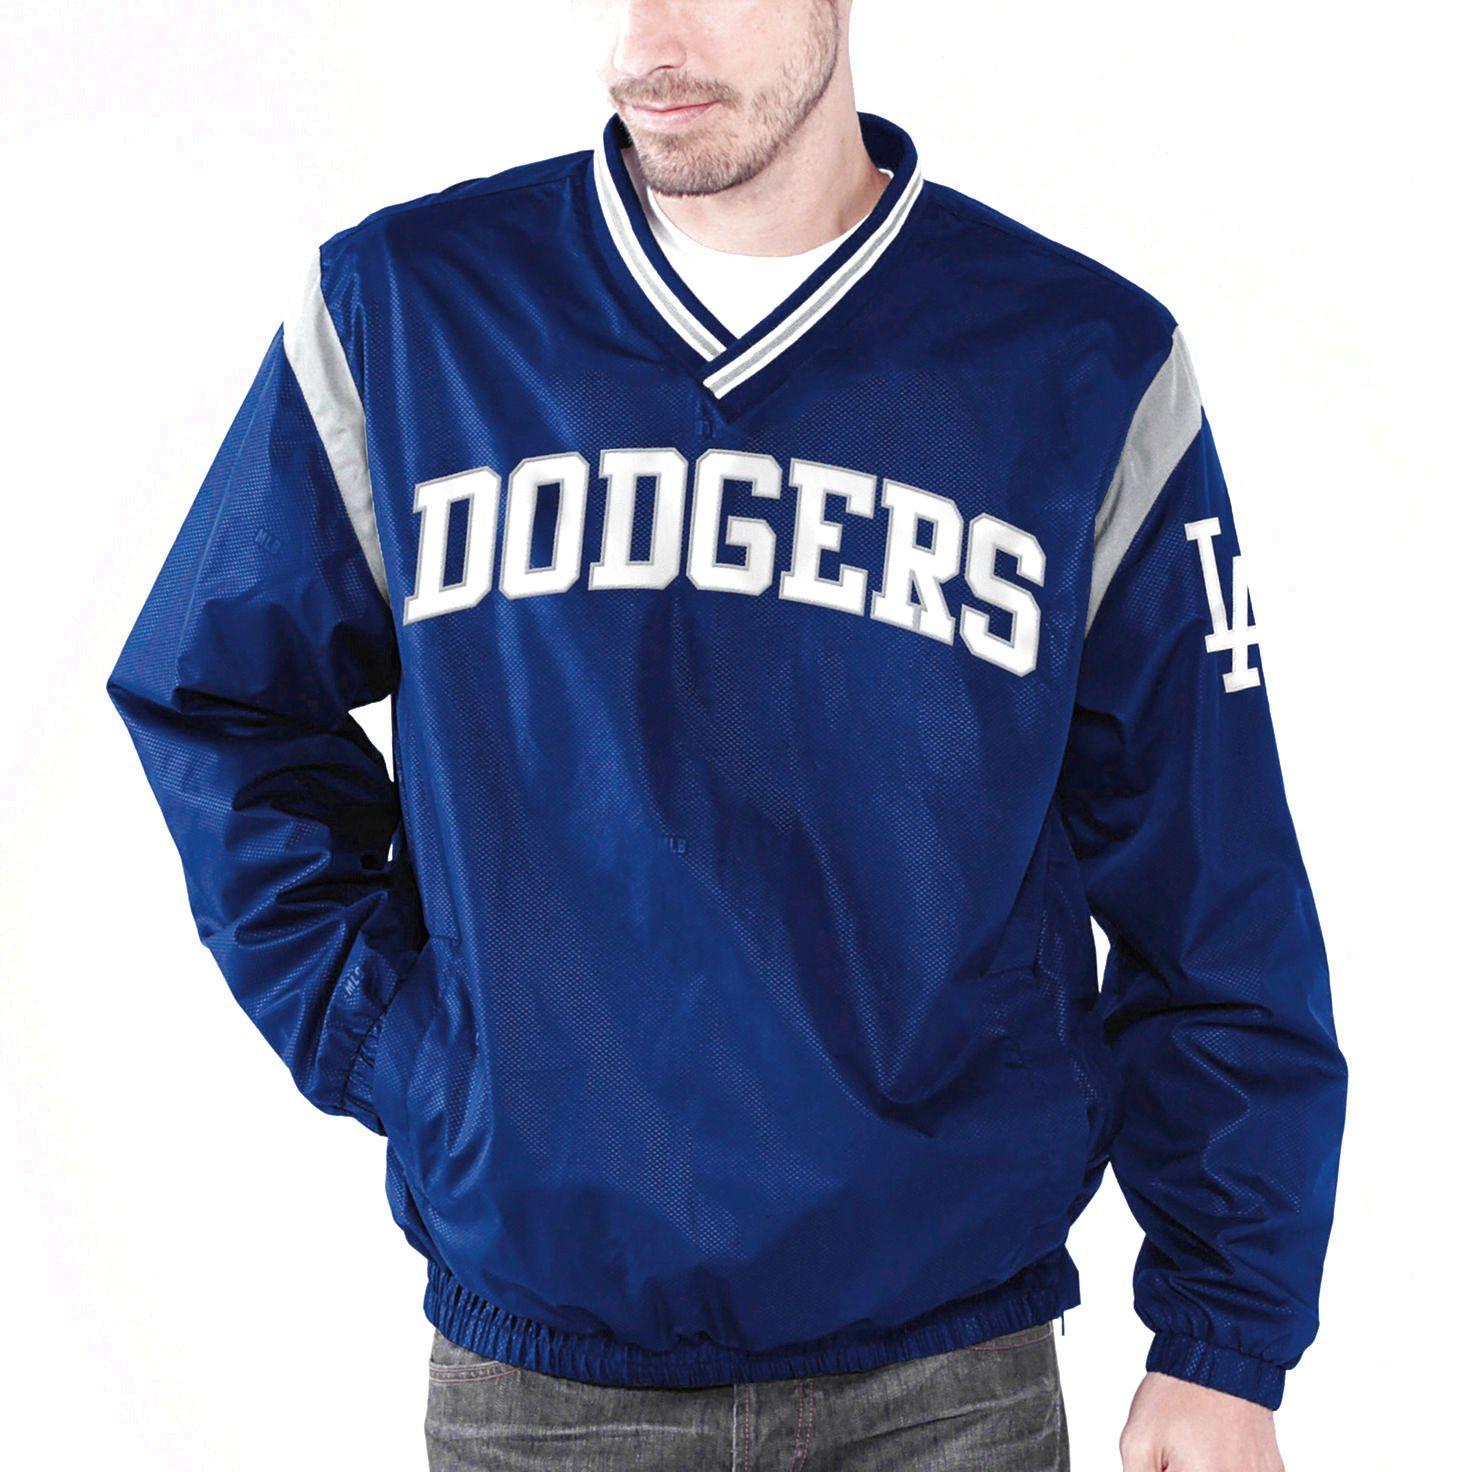 La dodgers wild pitch v neck pullover jacket royal blue la dodgers wild pitch v neck pullover jacket royal blue 4799 buycottarizona Image collections